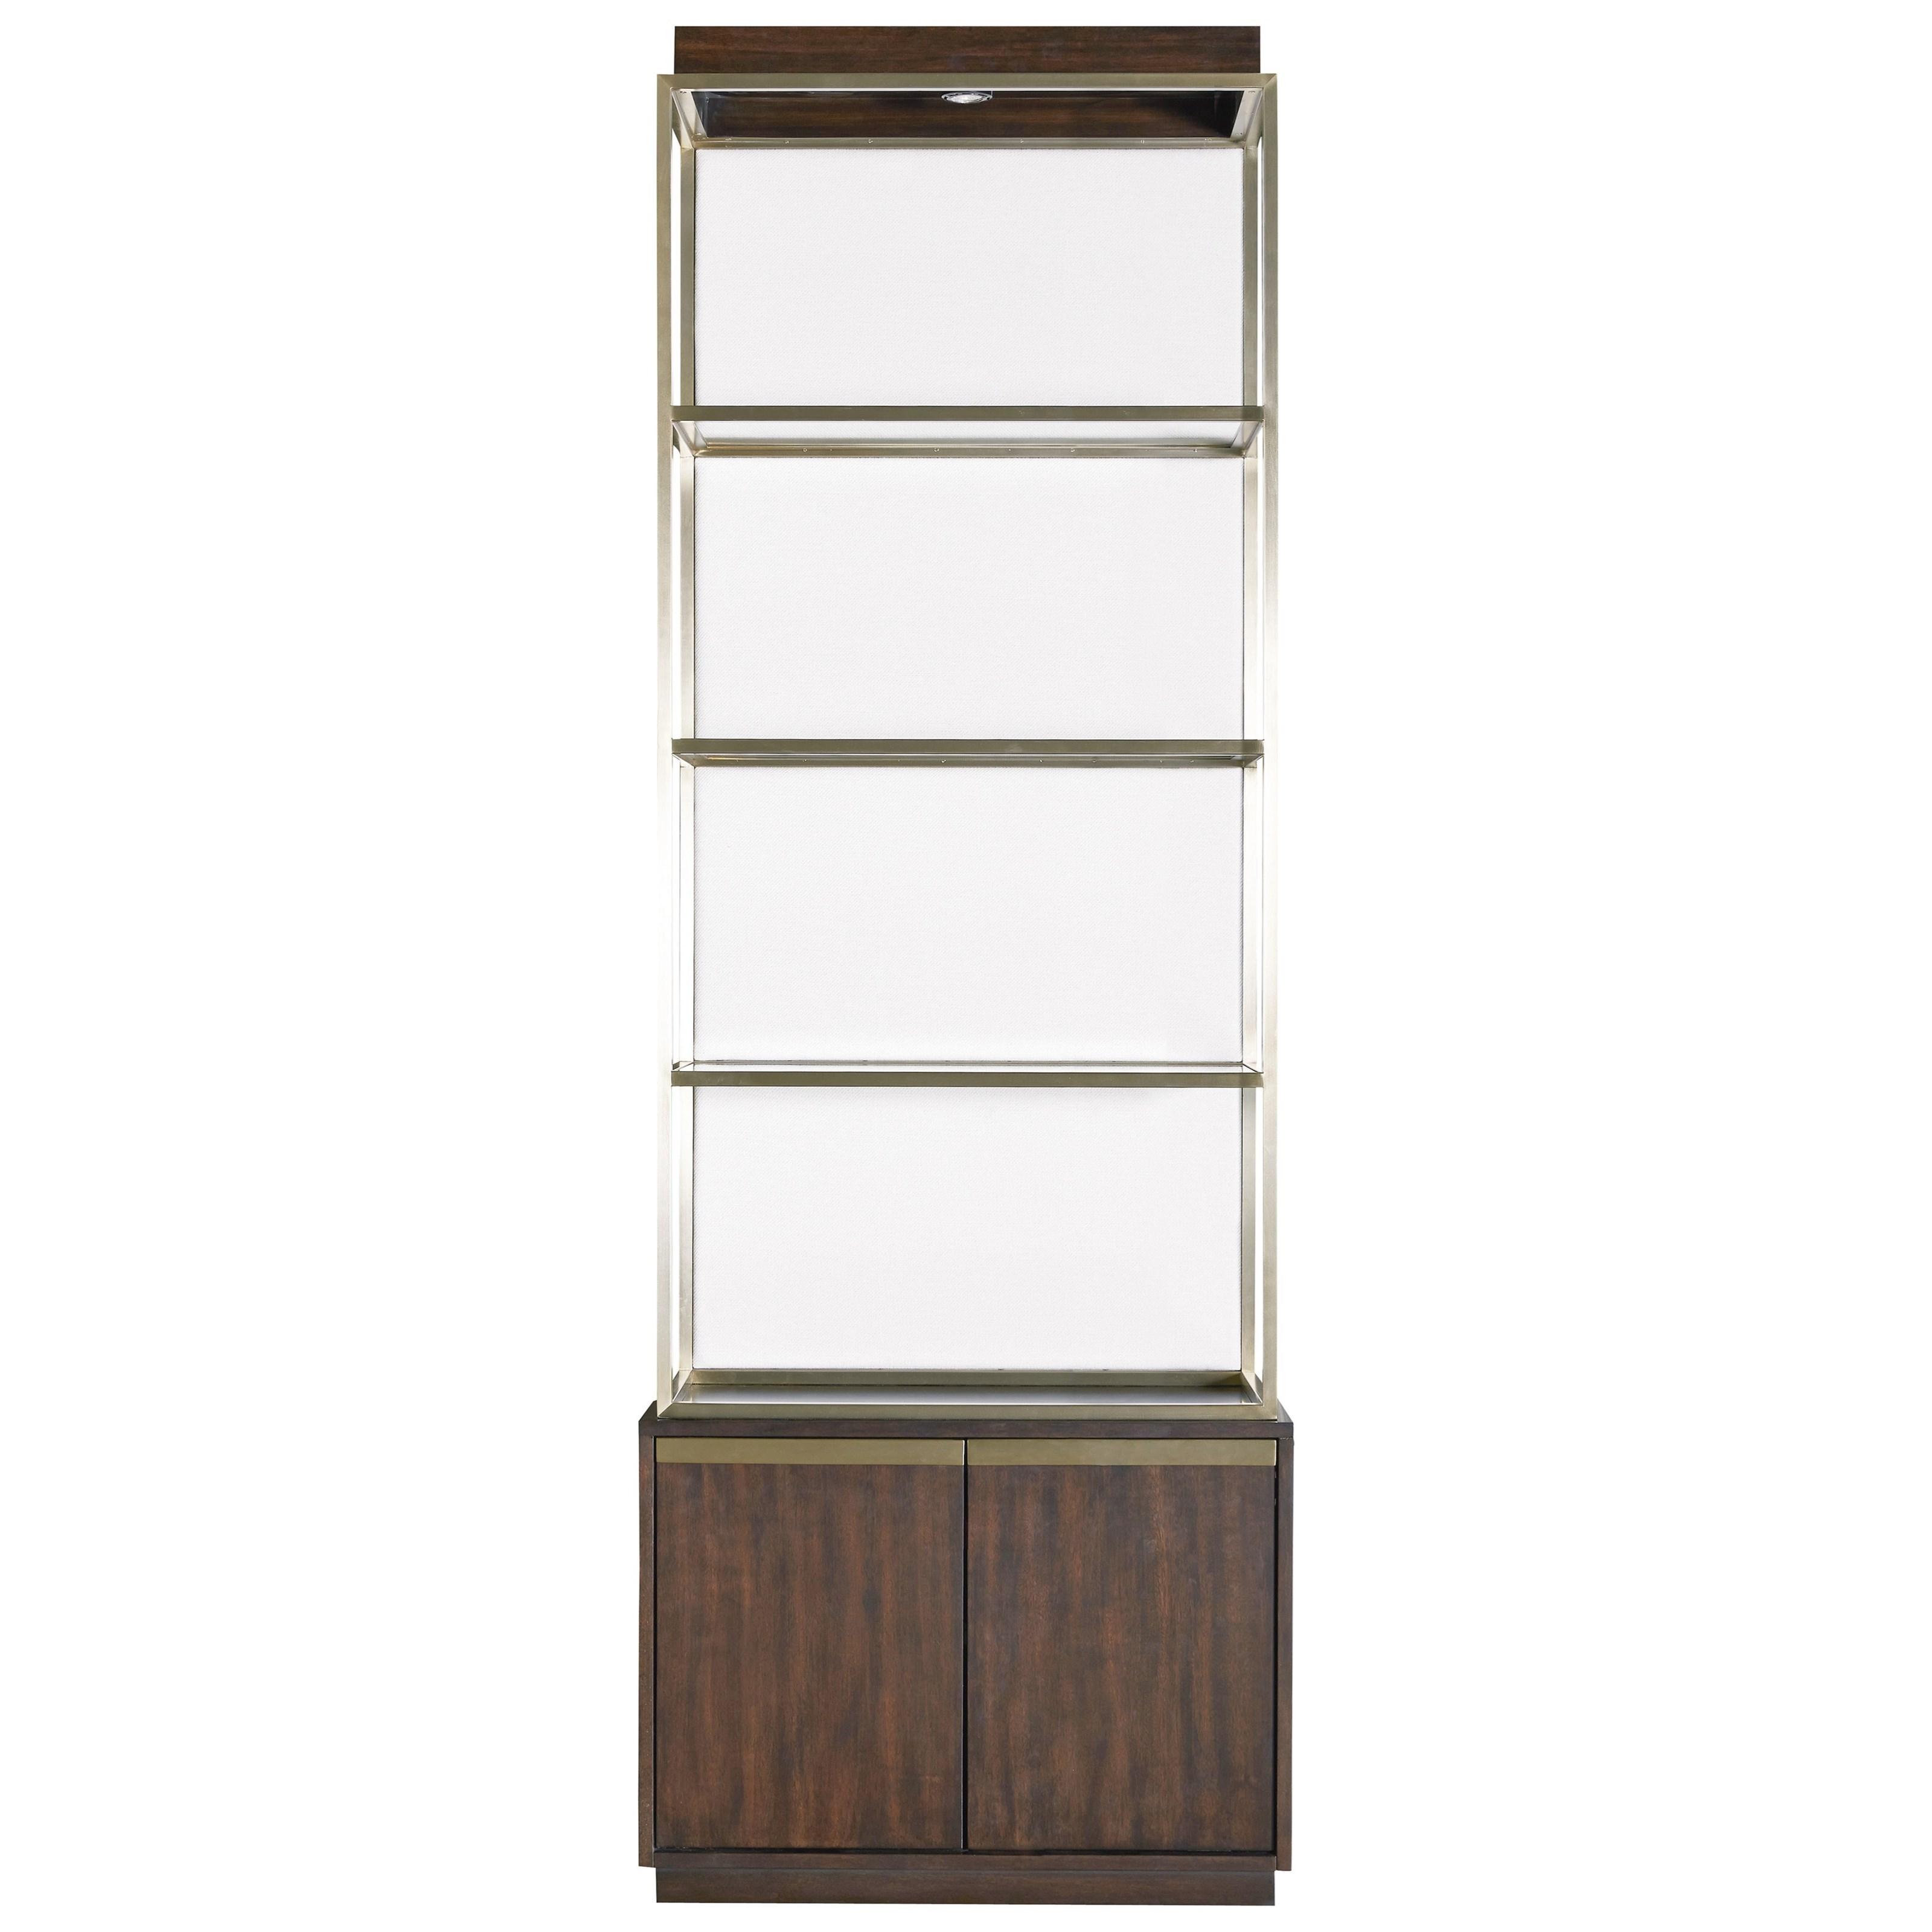 universal modern bronze garland etagere complete reeds furniture open bookcases. Black Bedroom Furniture Sets. Home Design Ideas